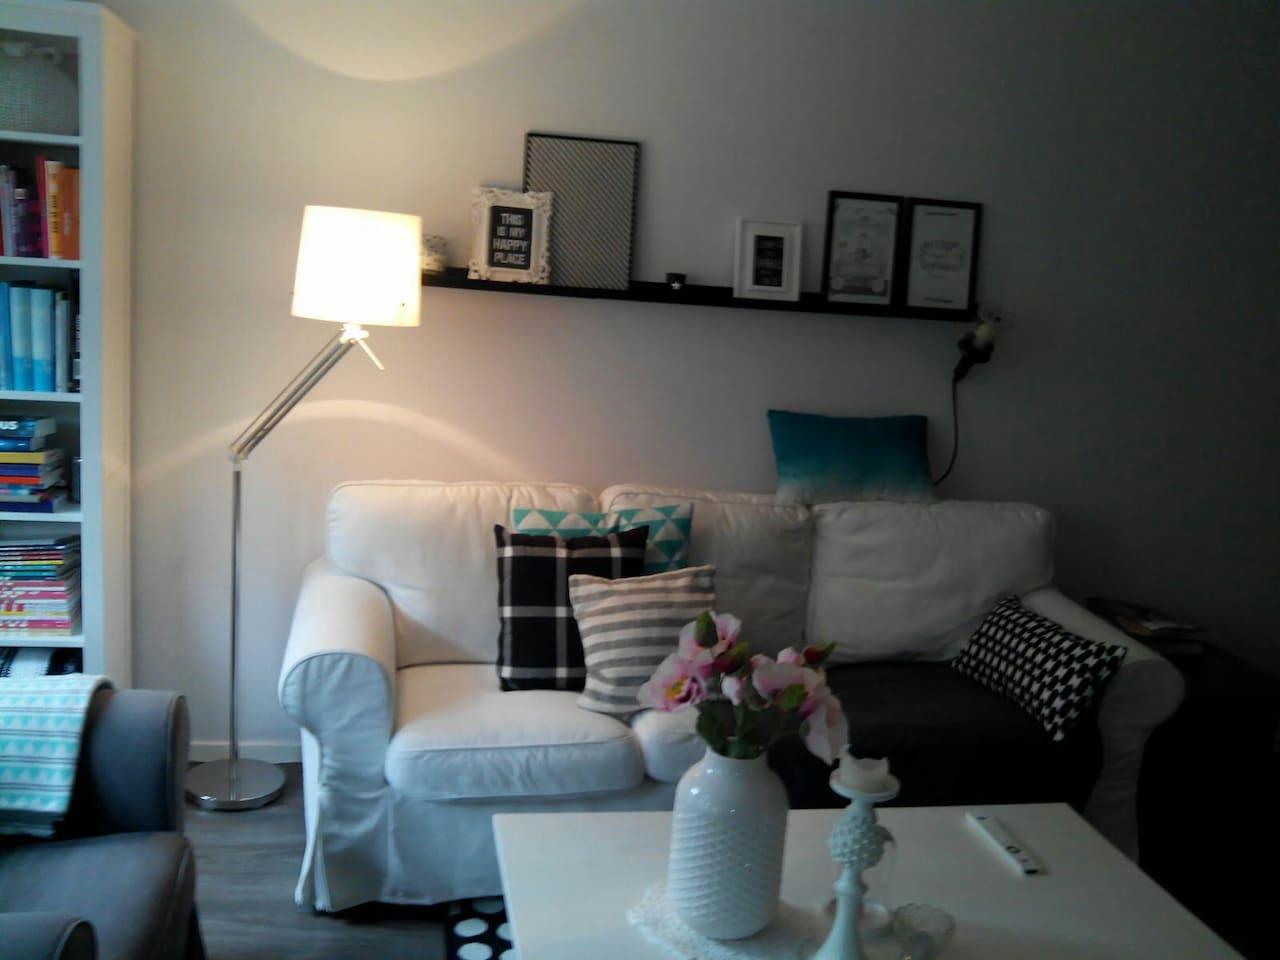 Appartment in Apeldoorn city centre